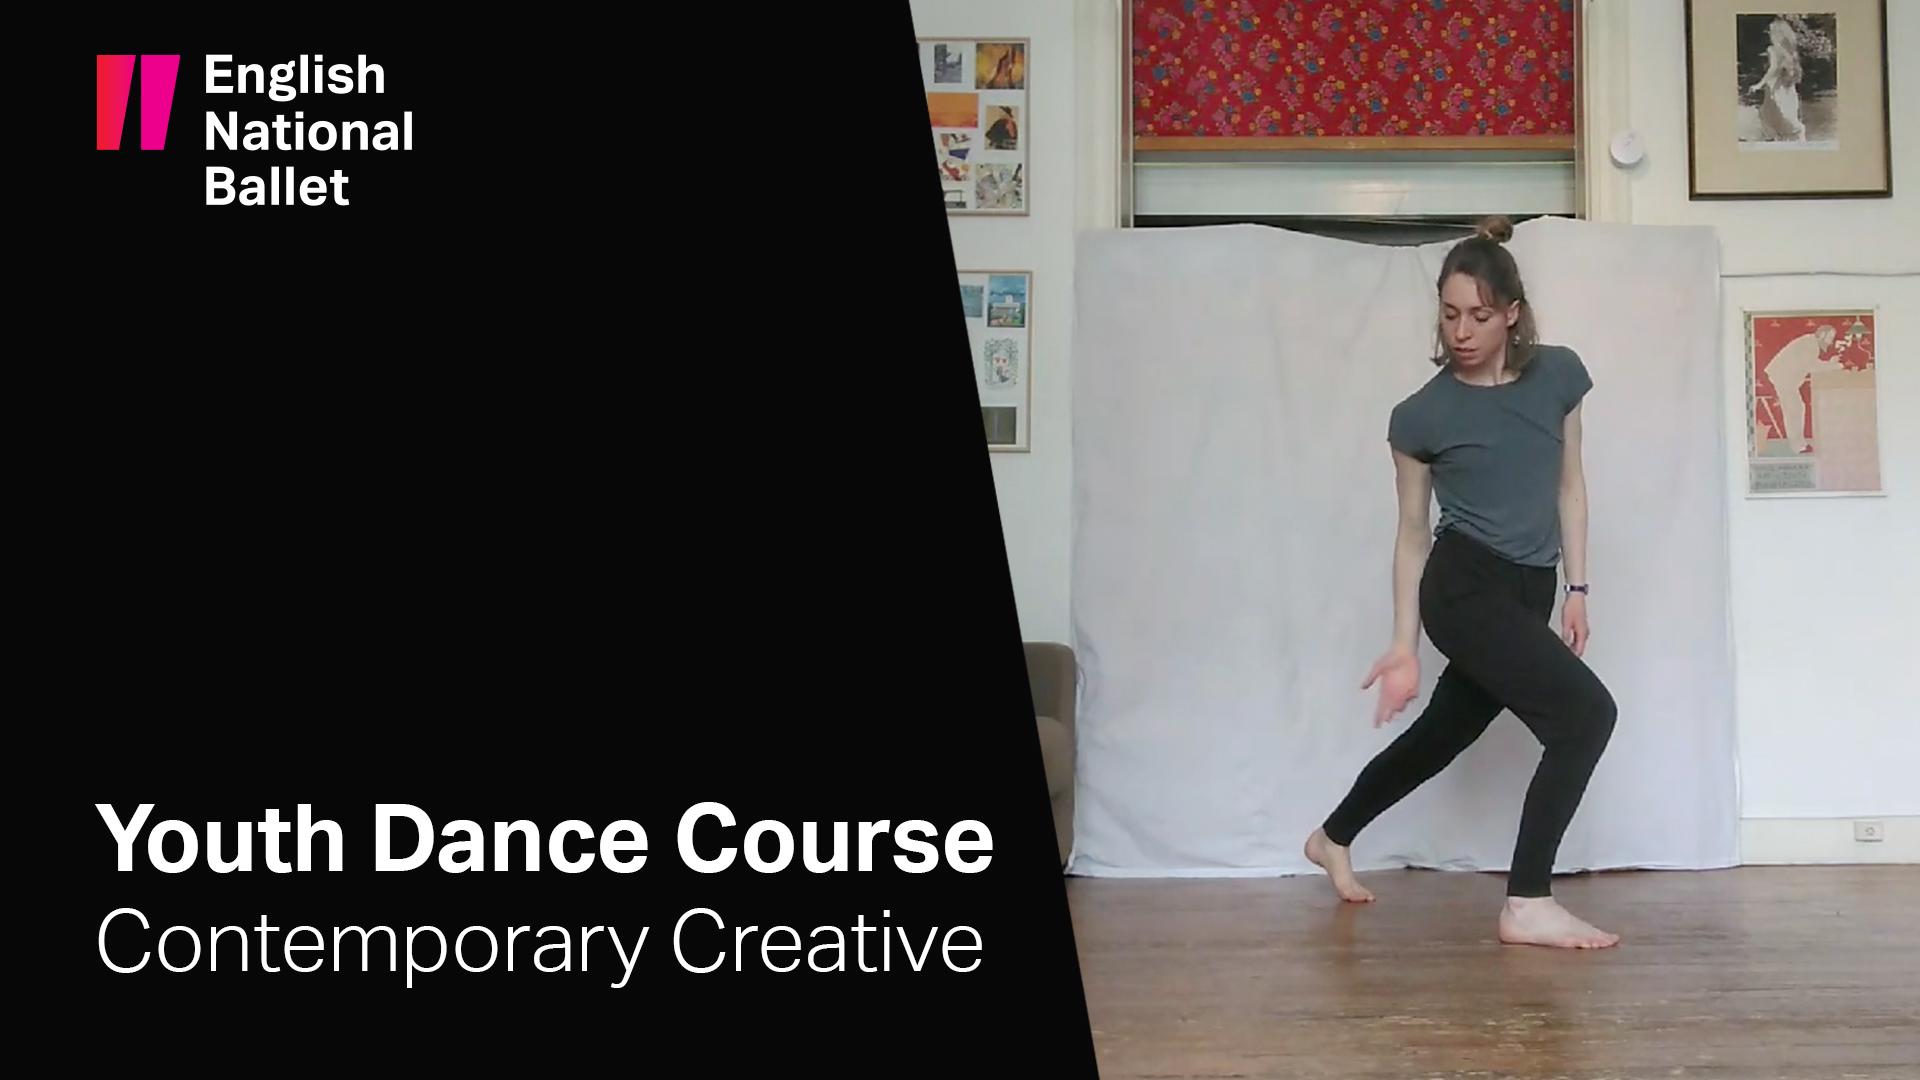 Youth Dance Course: Contemporary Creative | English National Ballet